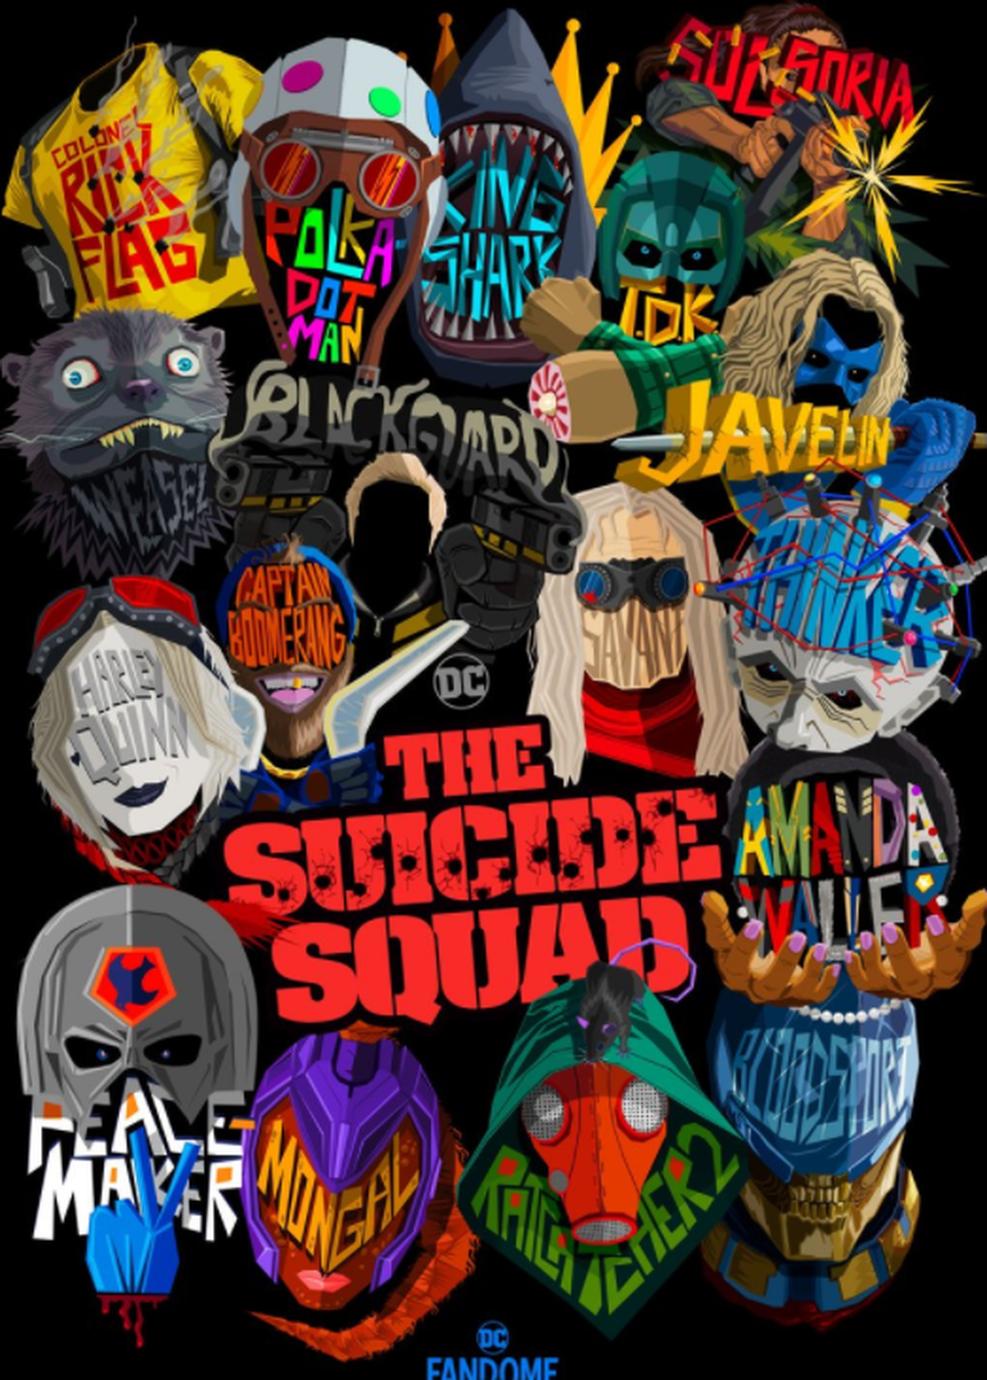 esquadrao_suicida_poster_james_gunn